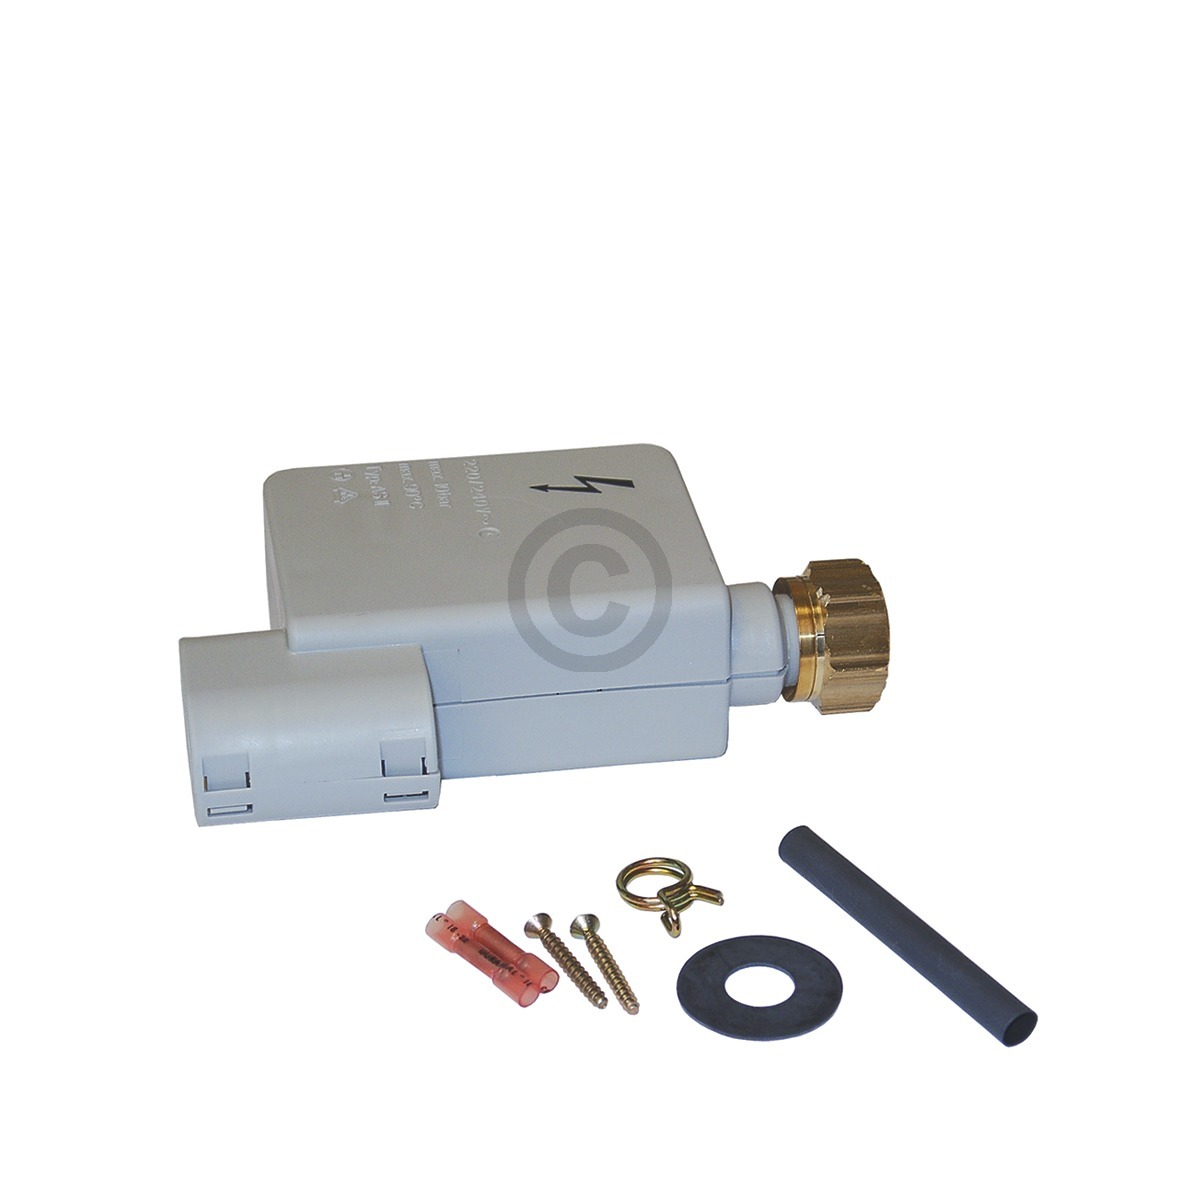 Magnetventil-Reparatursatz 00091058 091058 Bosch, Siemens, Neff, Küppersbusch